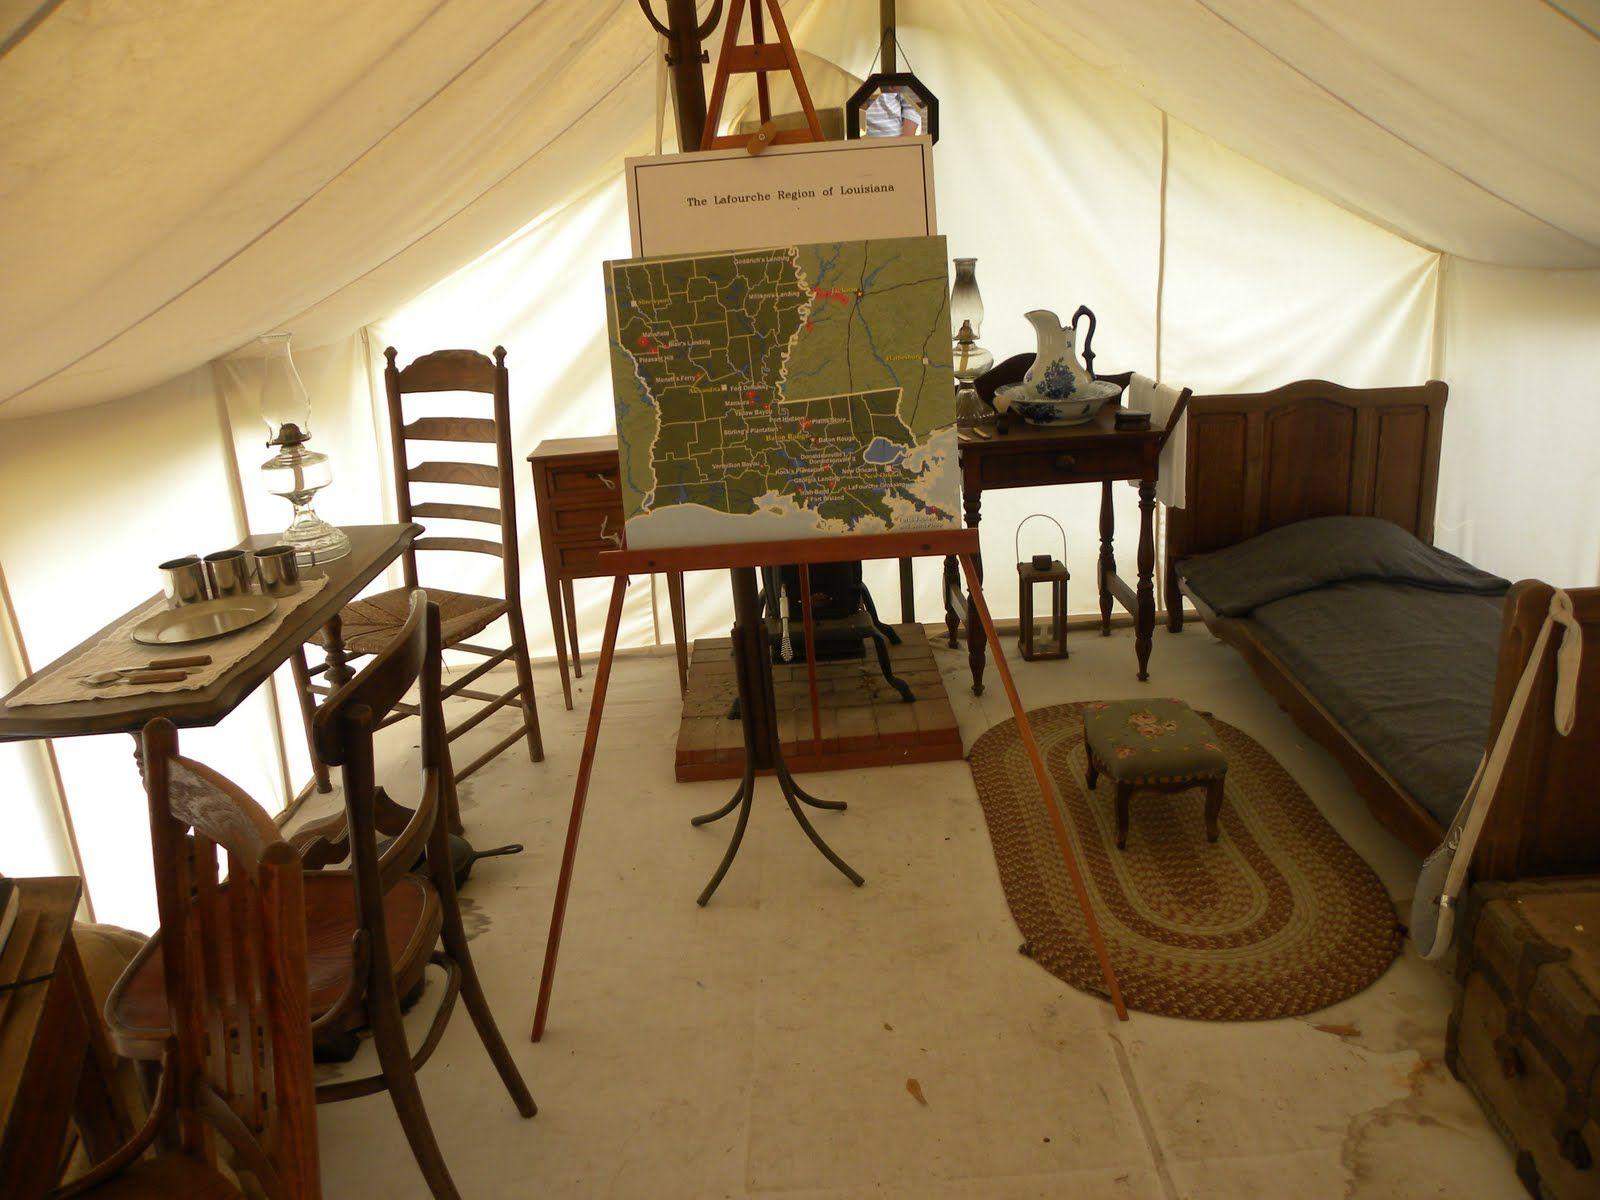 Confederate Tent Civil War Photos Camp Furniture